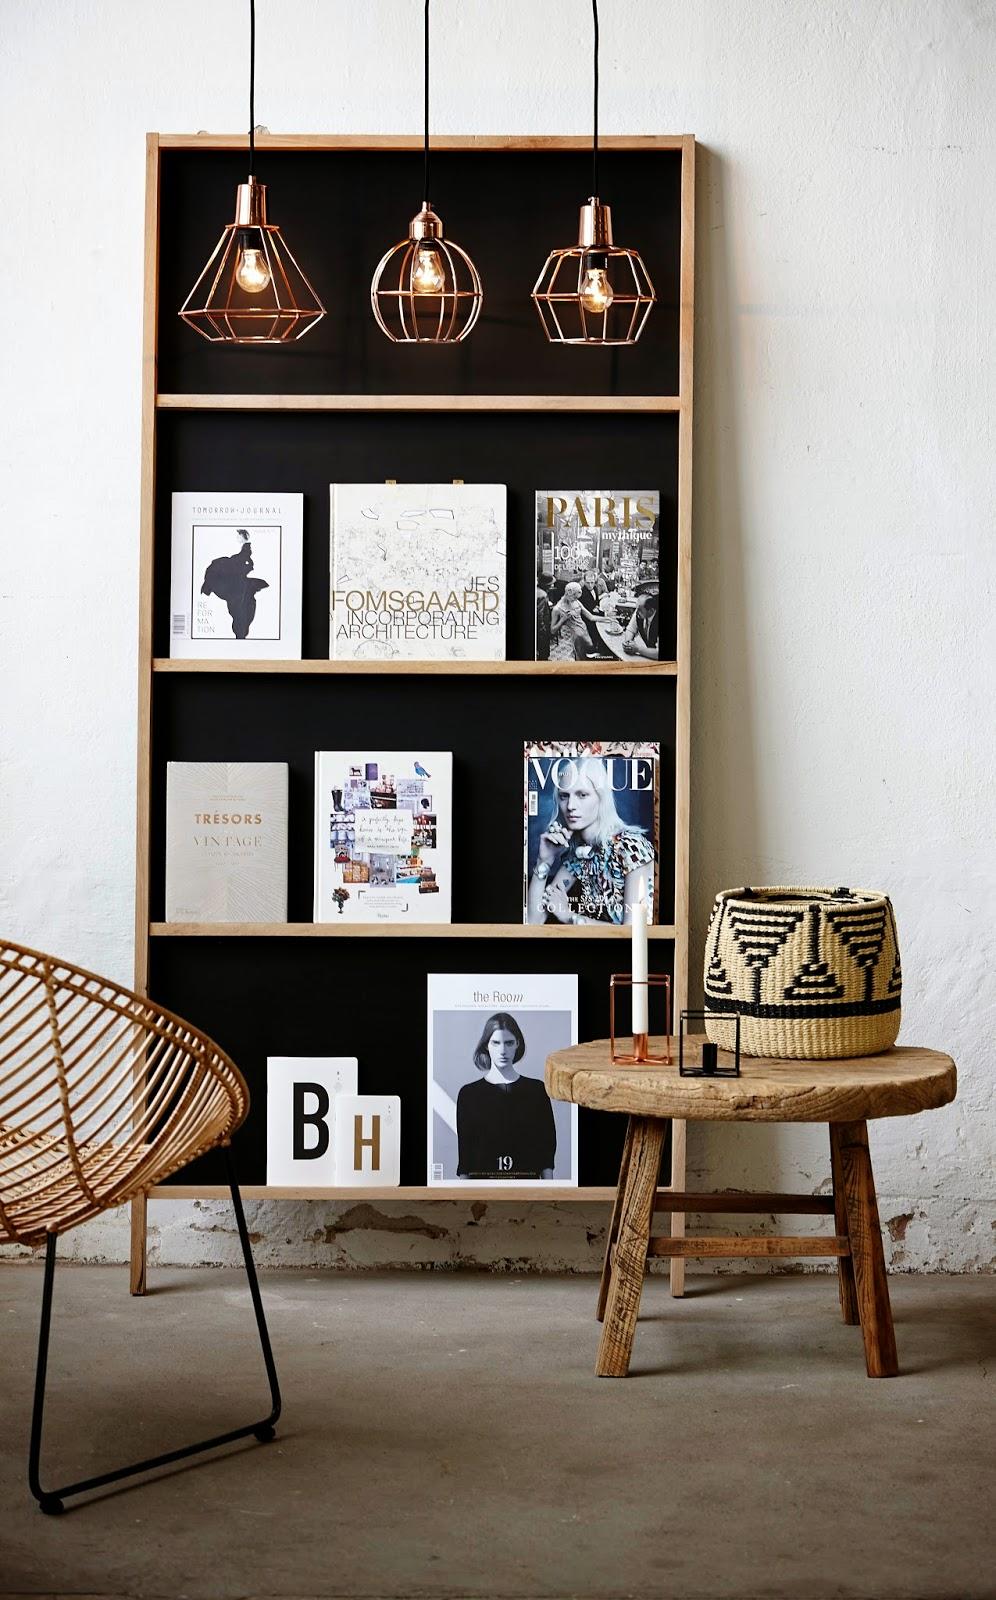 tema shop hubsch aw 2015. Black Bedroom Furniture Sets. Home Design Ideas